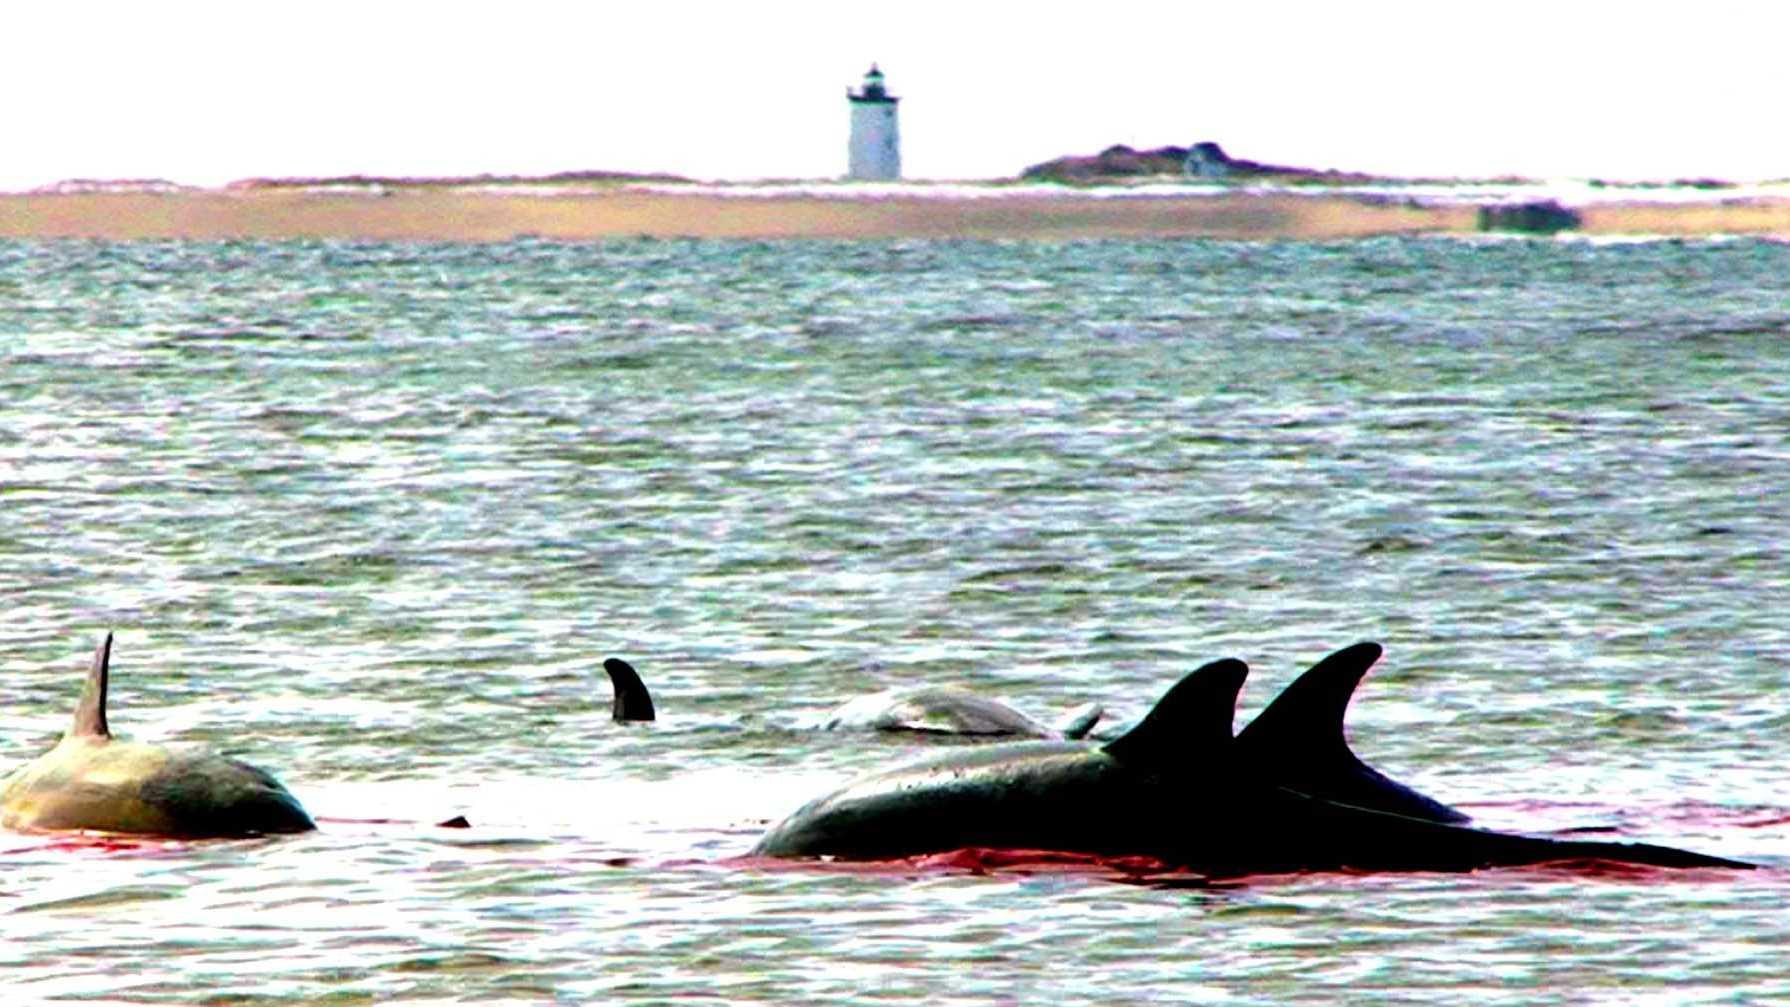 Dolphin stranding 3.6